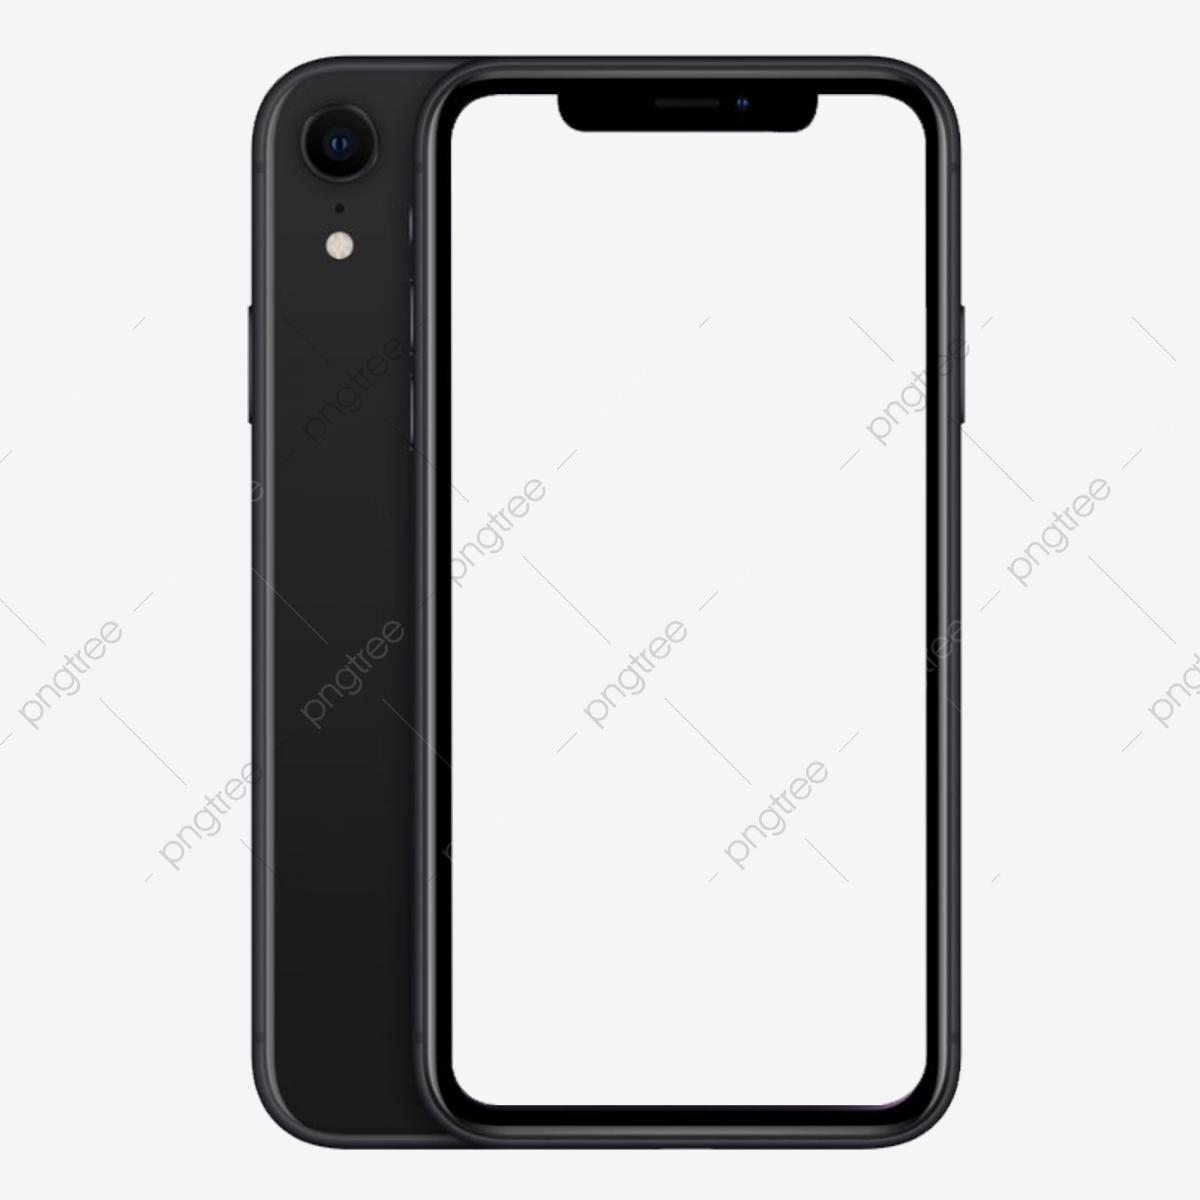 Iphone Xs Xs Max Jet Black Mockup Mobile Phone Replenishing Png